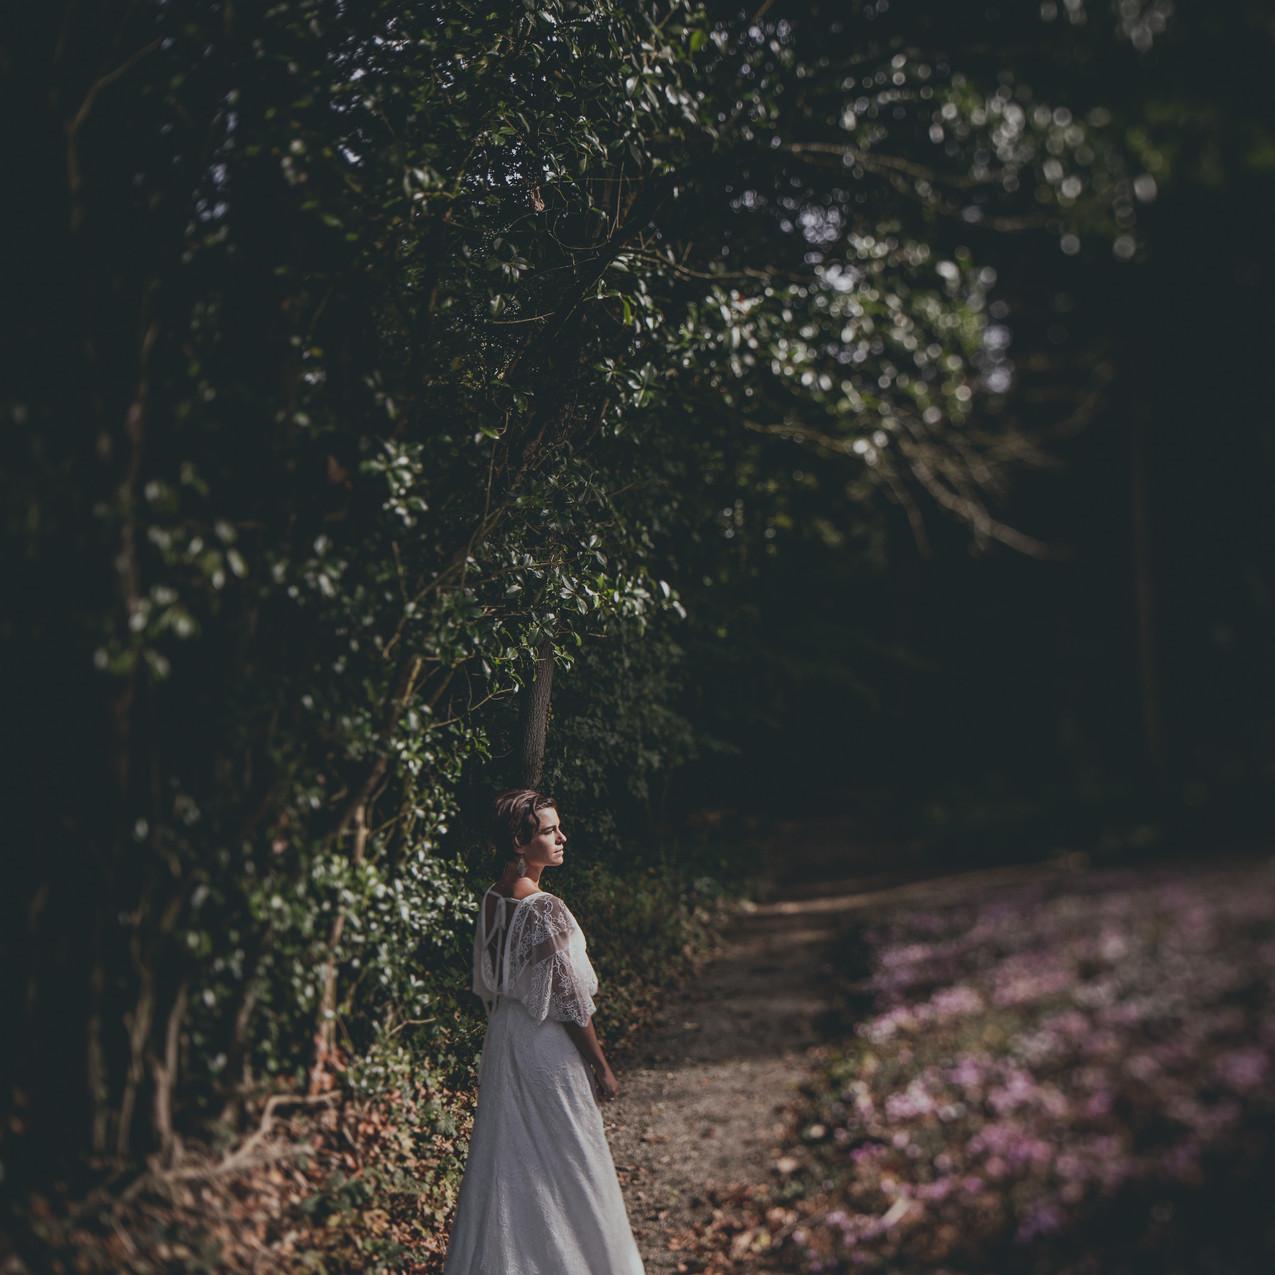 Photographe : Guillaume Ayer